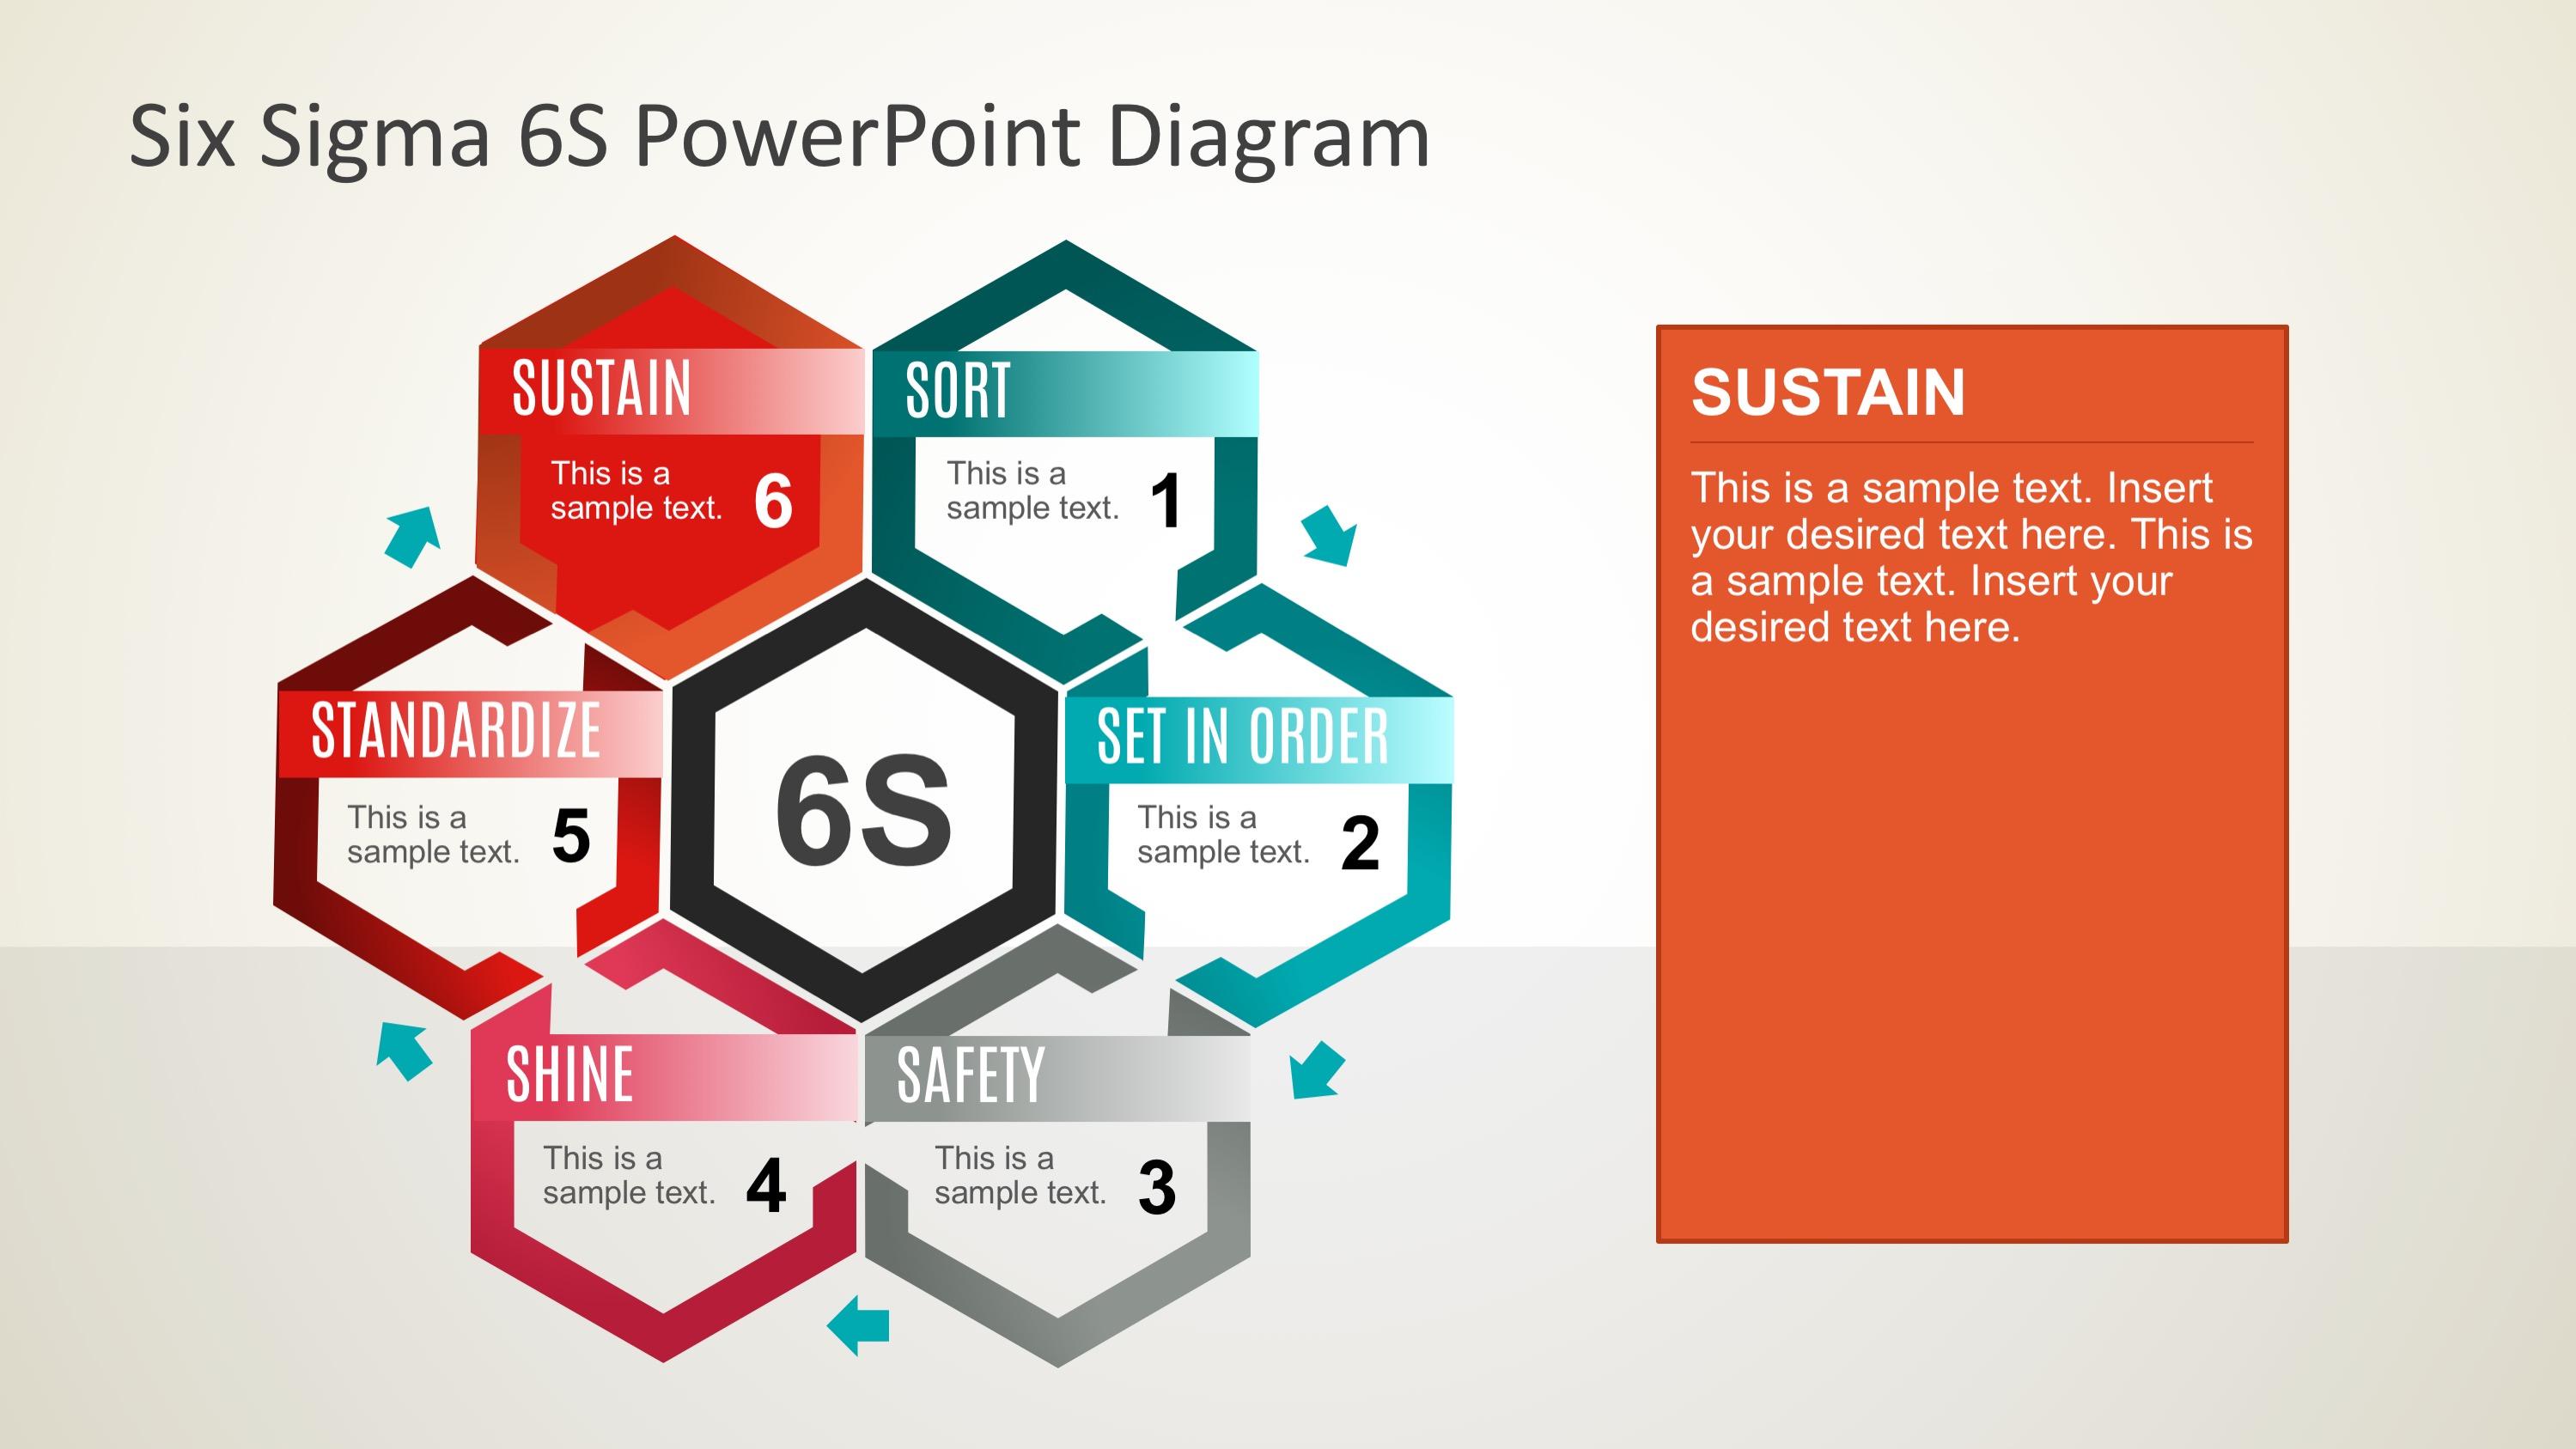 six sigma 6s powerpoint diagram slidemodel rh slidemodel com six sigma diagram visio six sigma diagram template